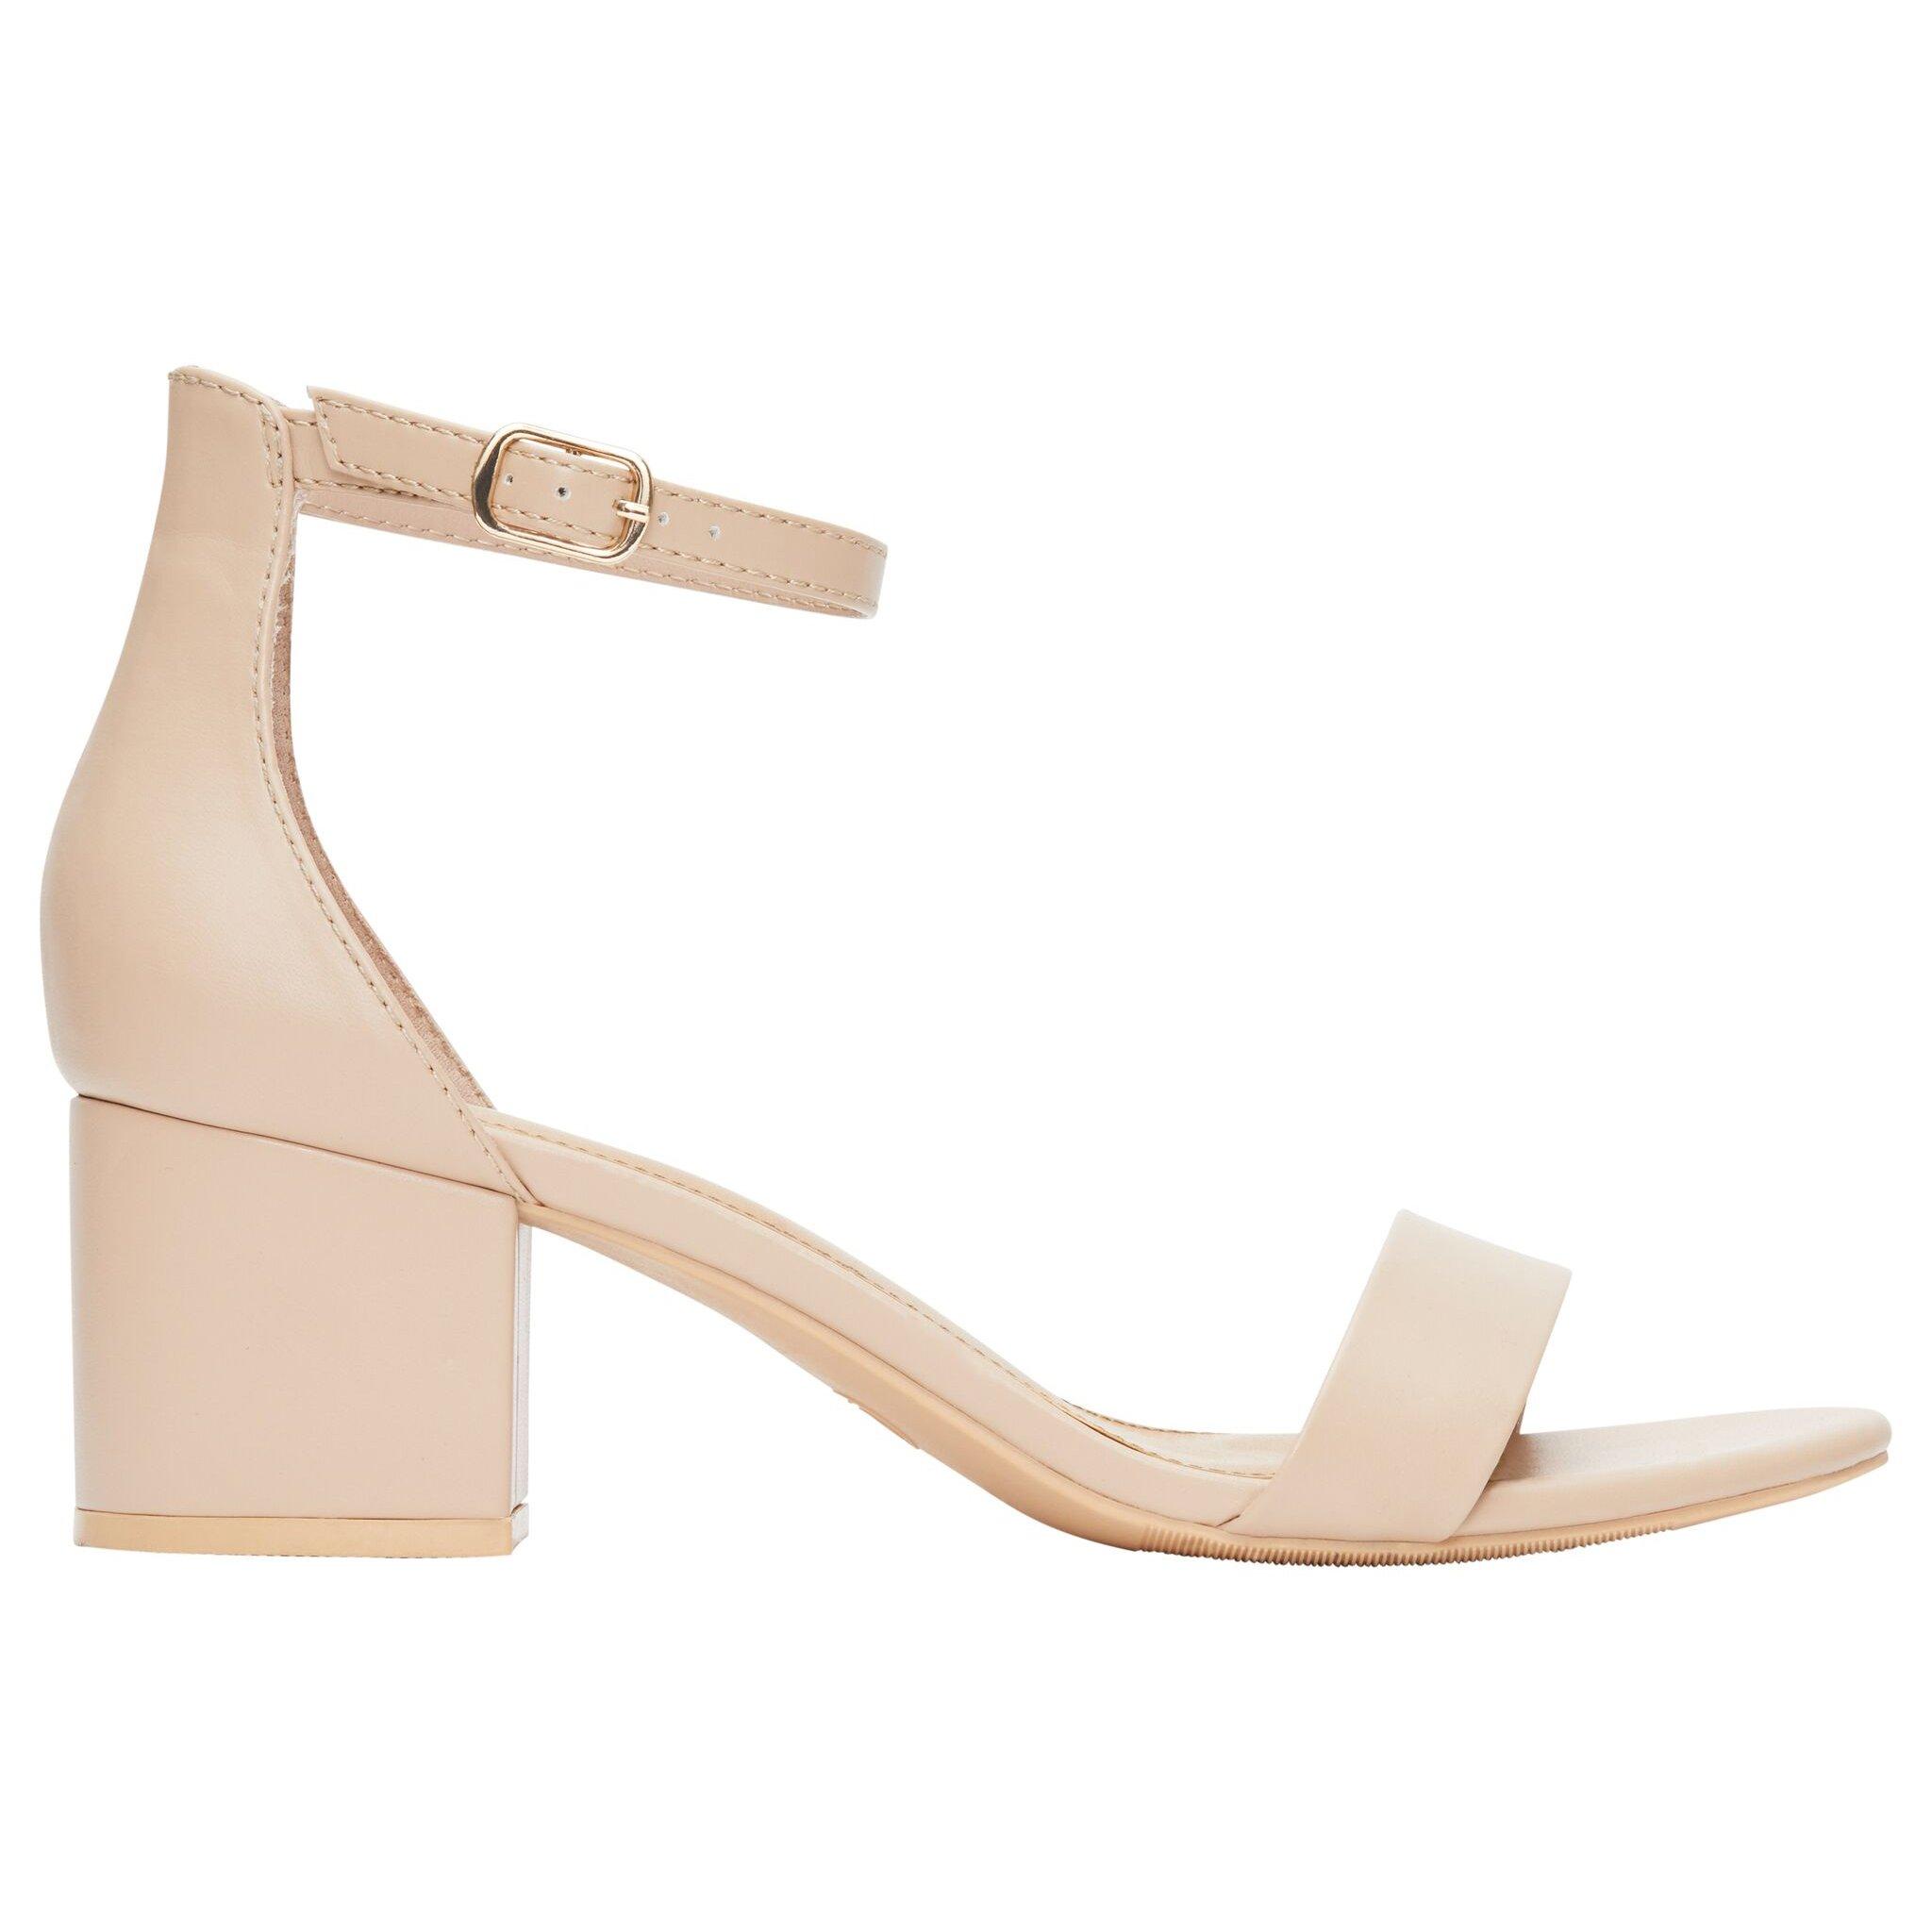 Rohb by Joyce Azria Calypso Mid Heel Ankle Strap Sandal (Nude Pu) Size 9.5